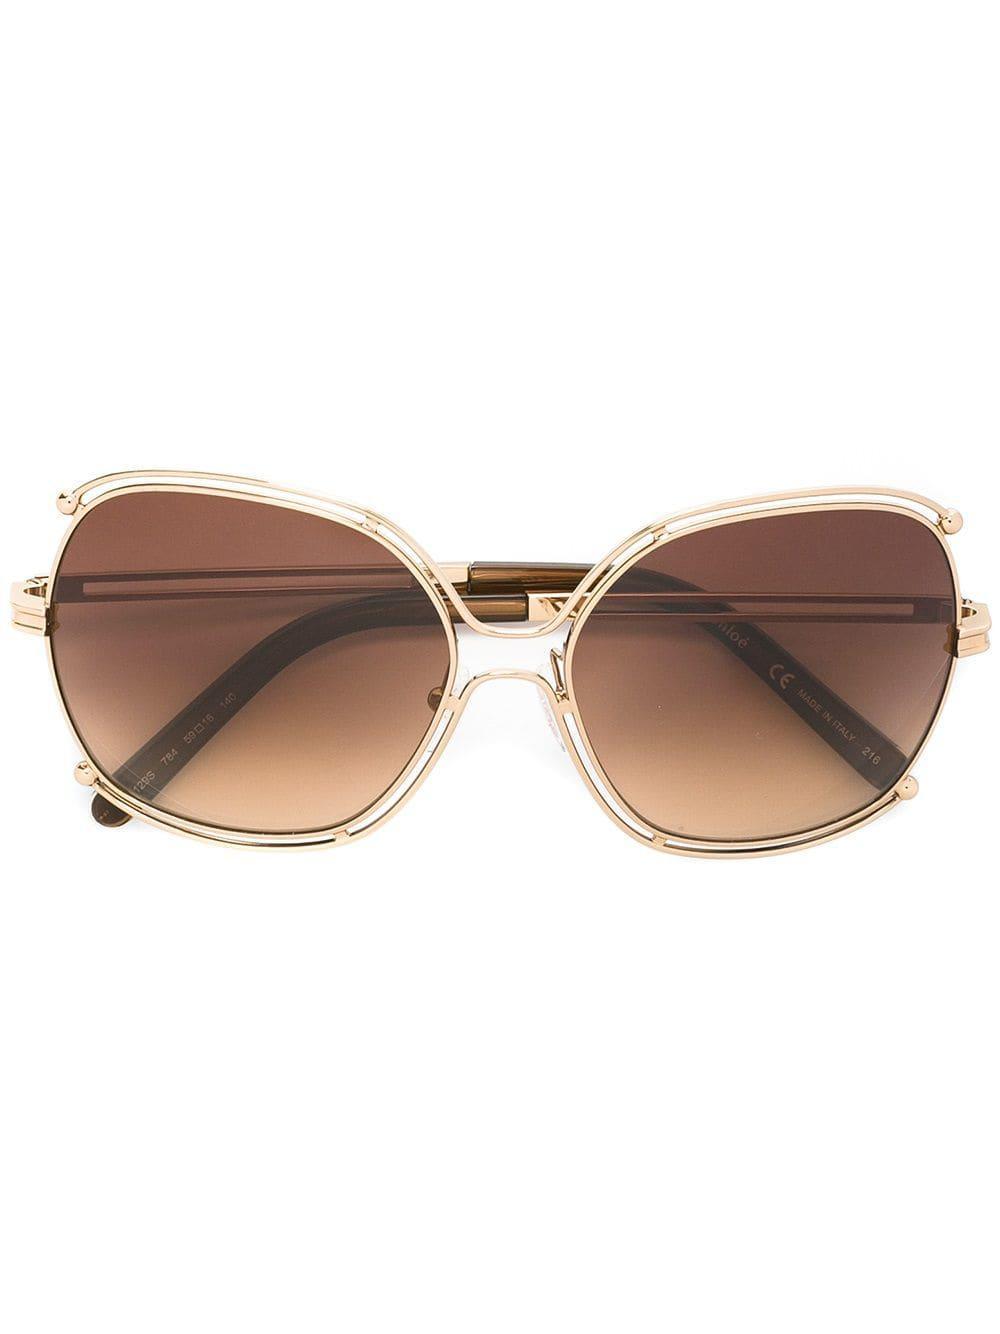 Chloé Geometric Metallic Frame Sunglasses